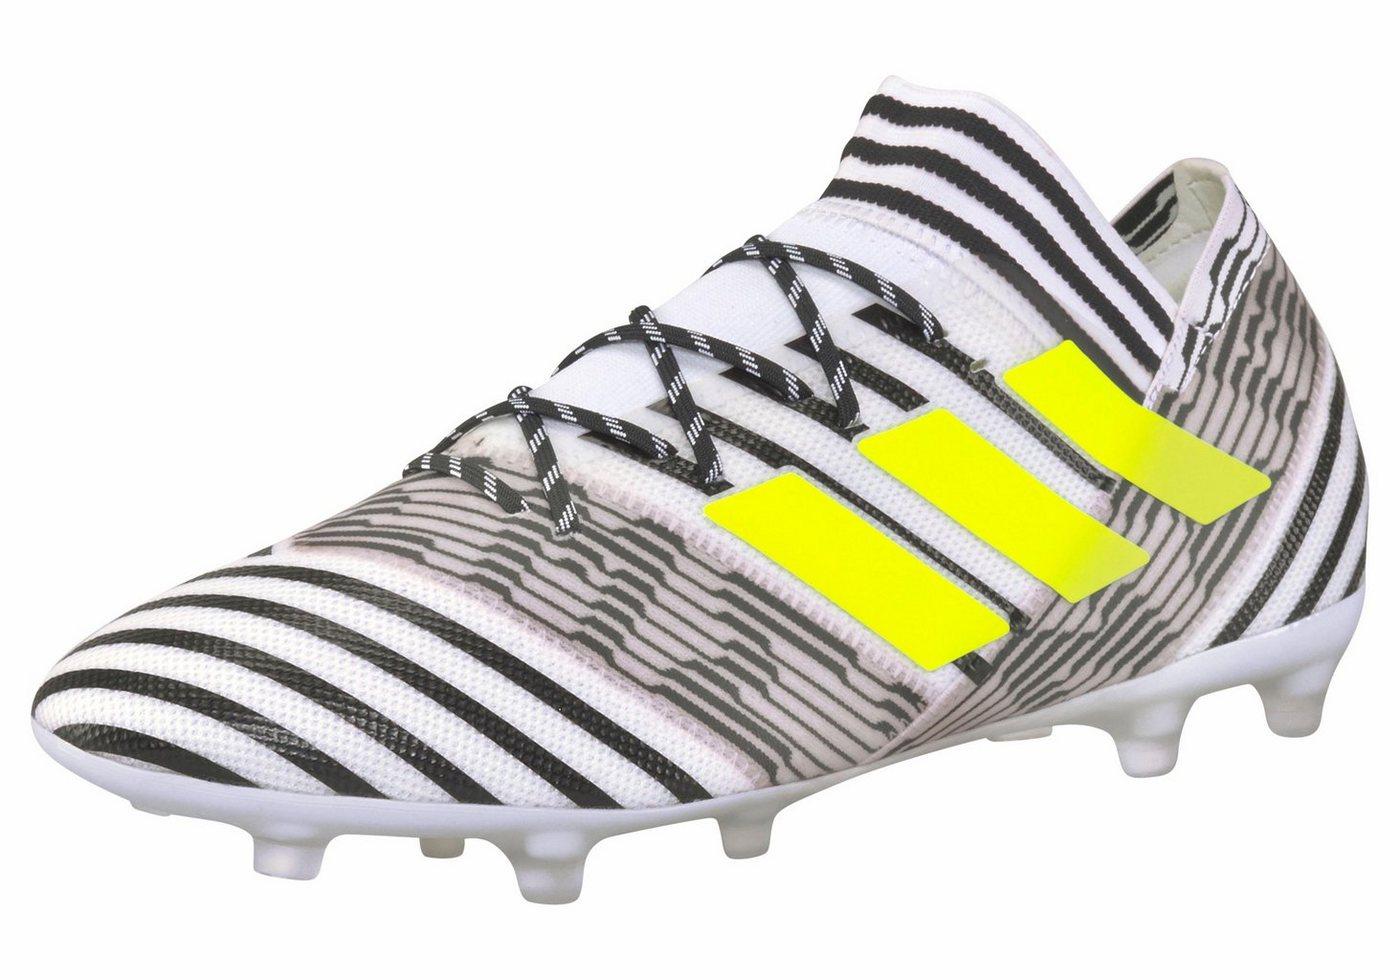 9e3ef5f0784 NU 21% KORTING adidas Performance NEMEZIZ 17.2 FG voetbalschoenen